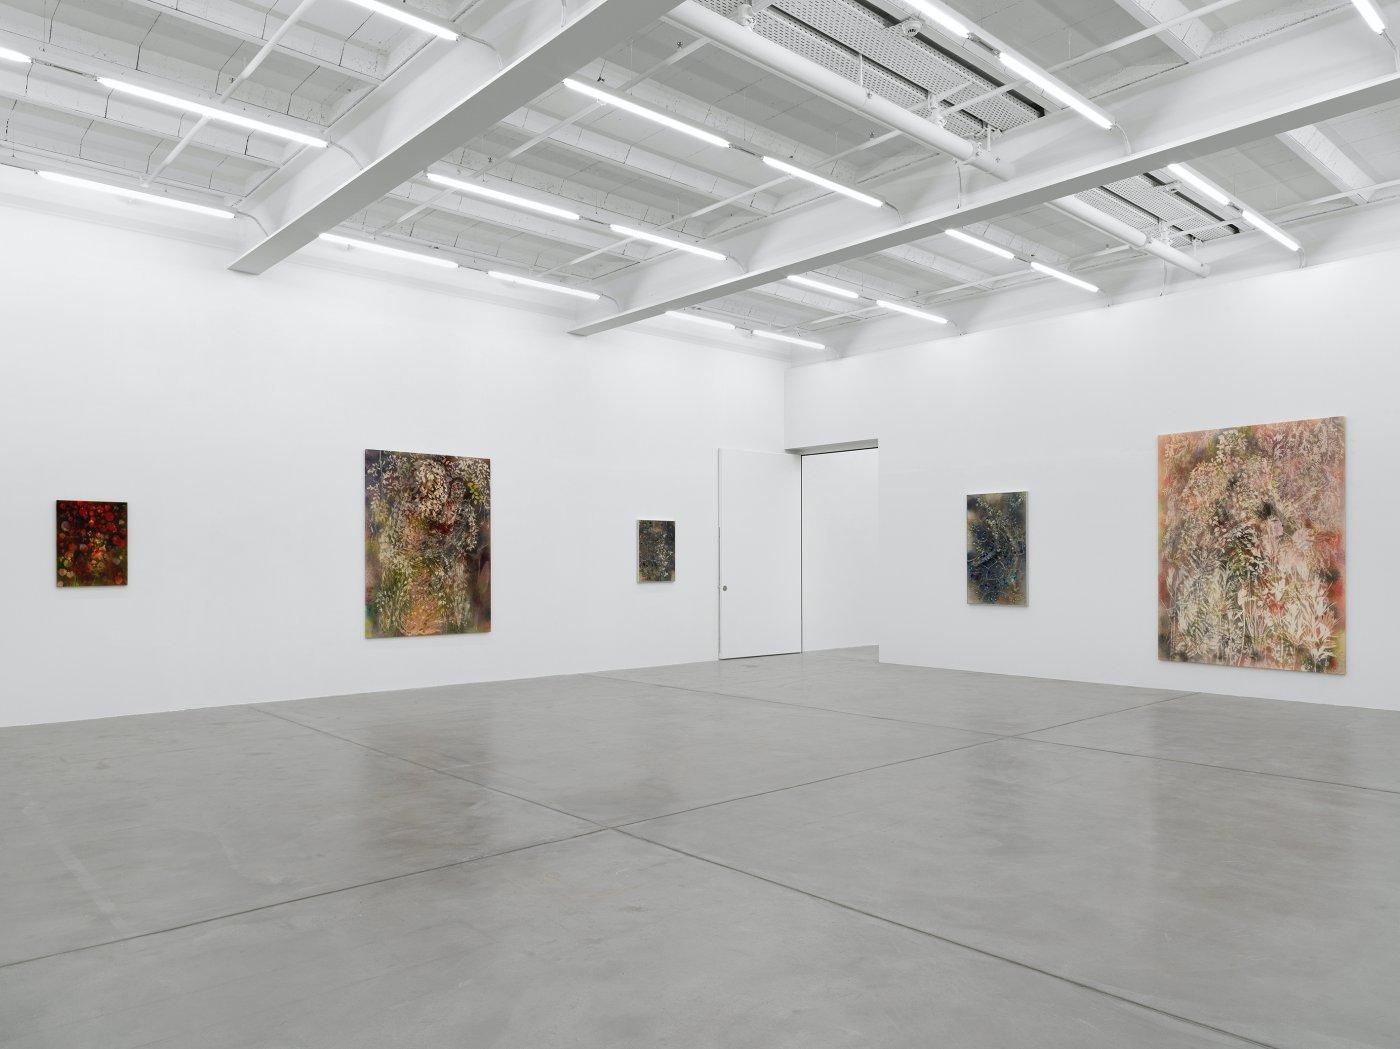 Galerie Eva Presenhuber Maag Areal Sam Falls 7